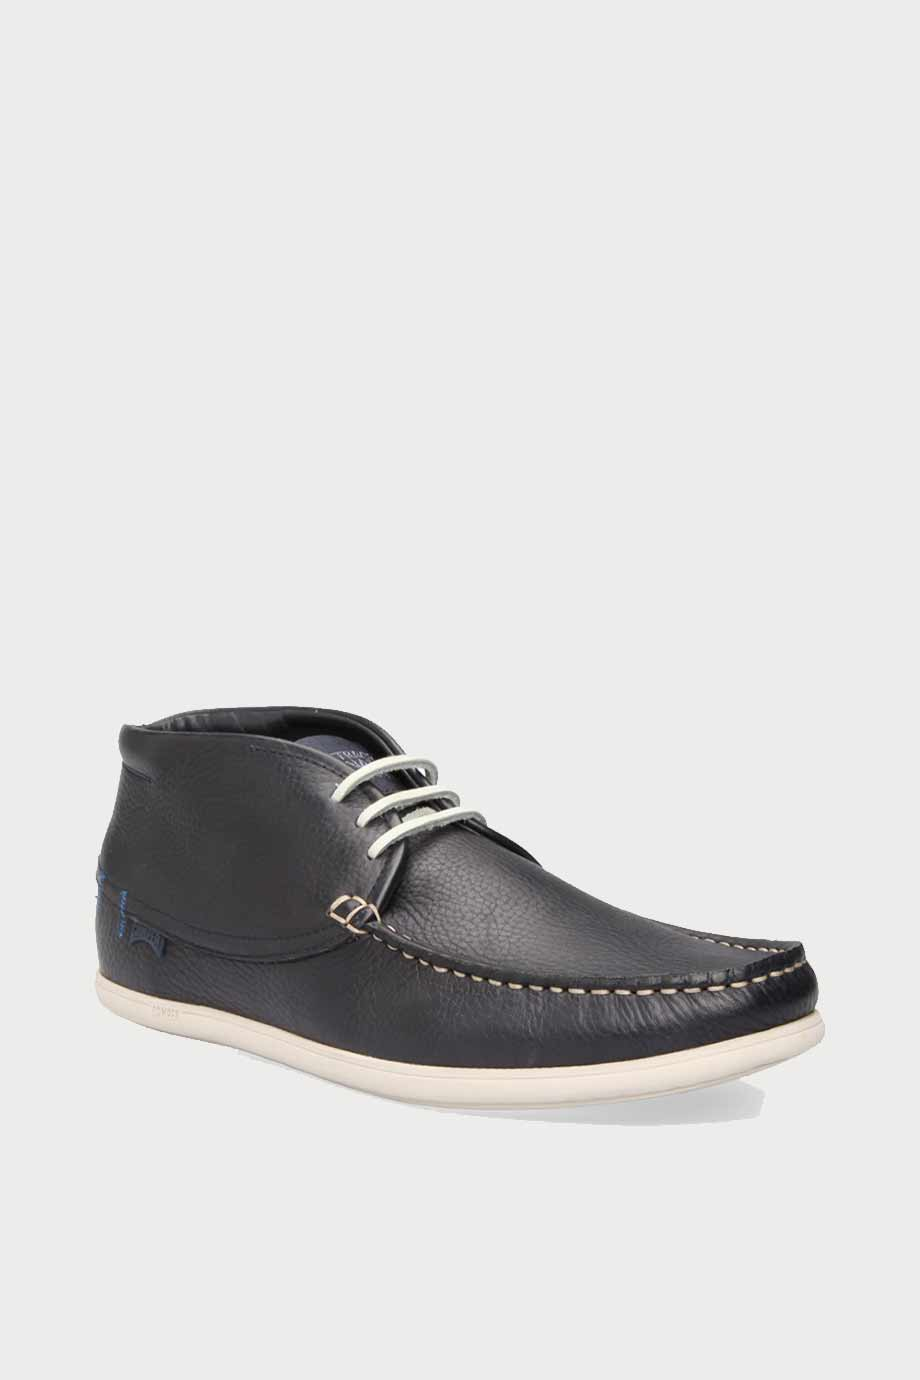 spiridoula metheniti shoes xalkida p Camper 36589 002 South 2